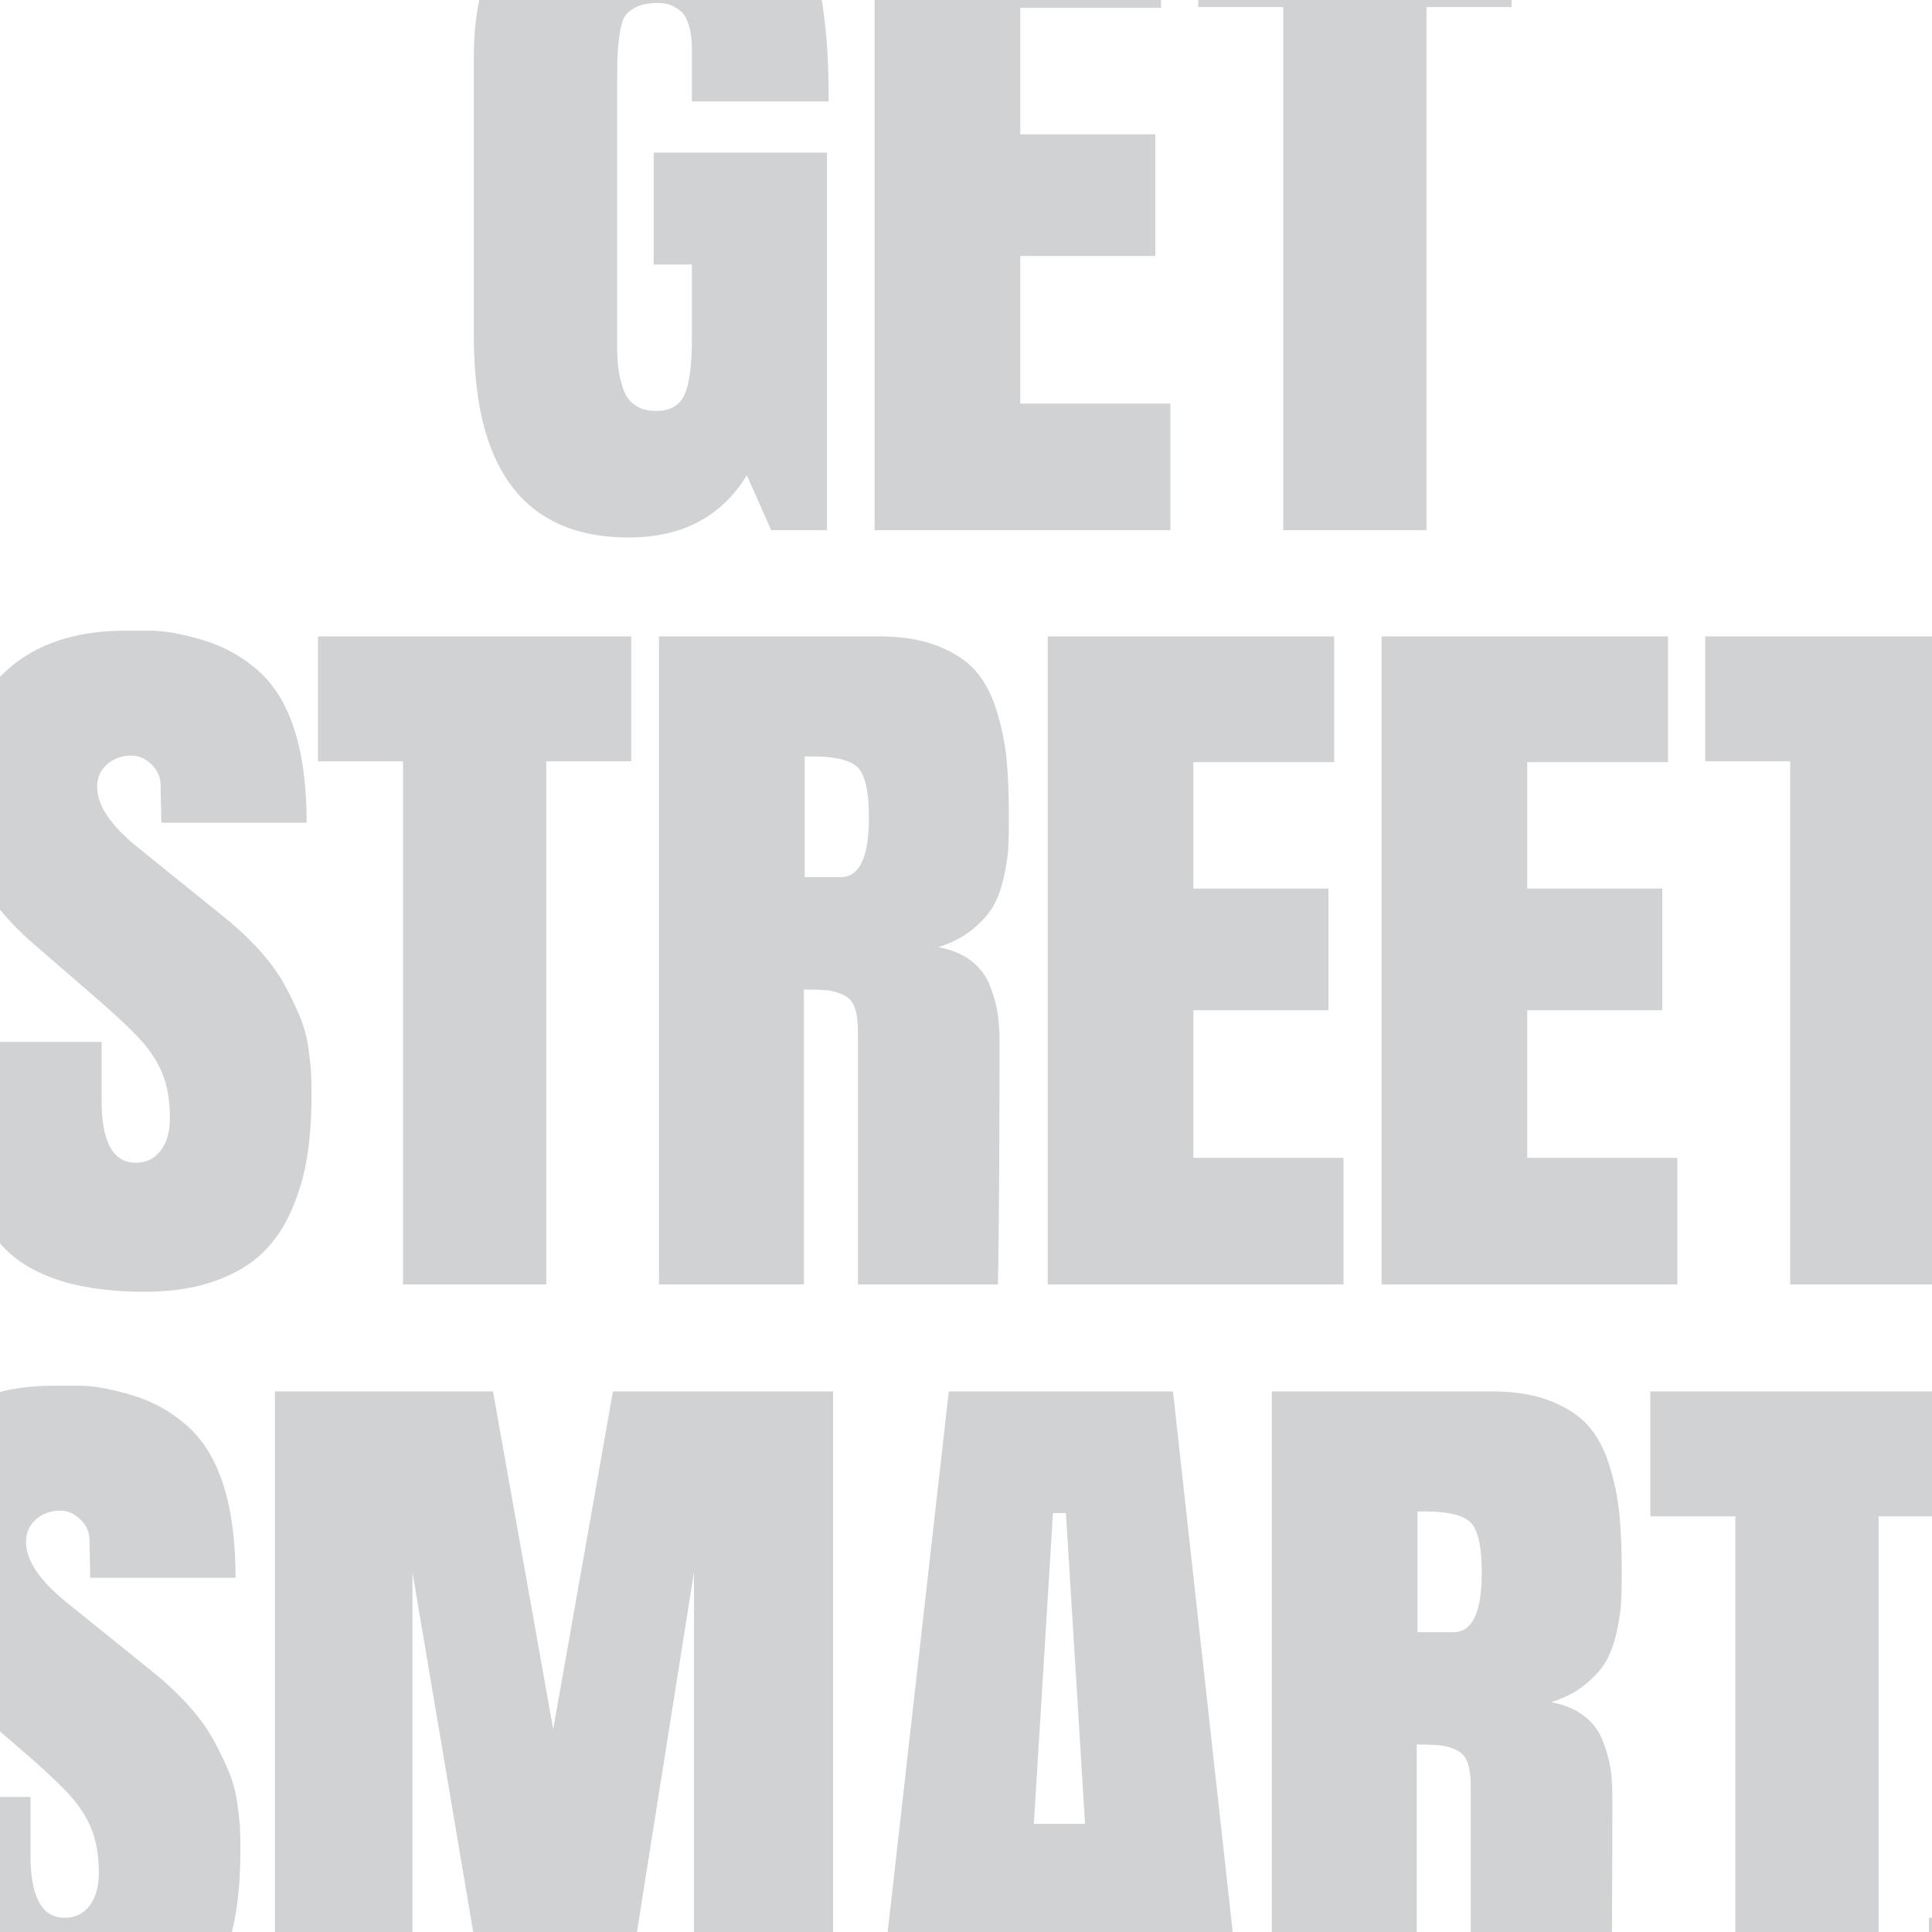 Work-11-StreetSmart.jpg